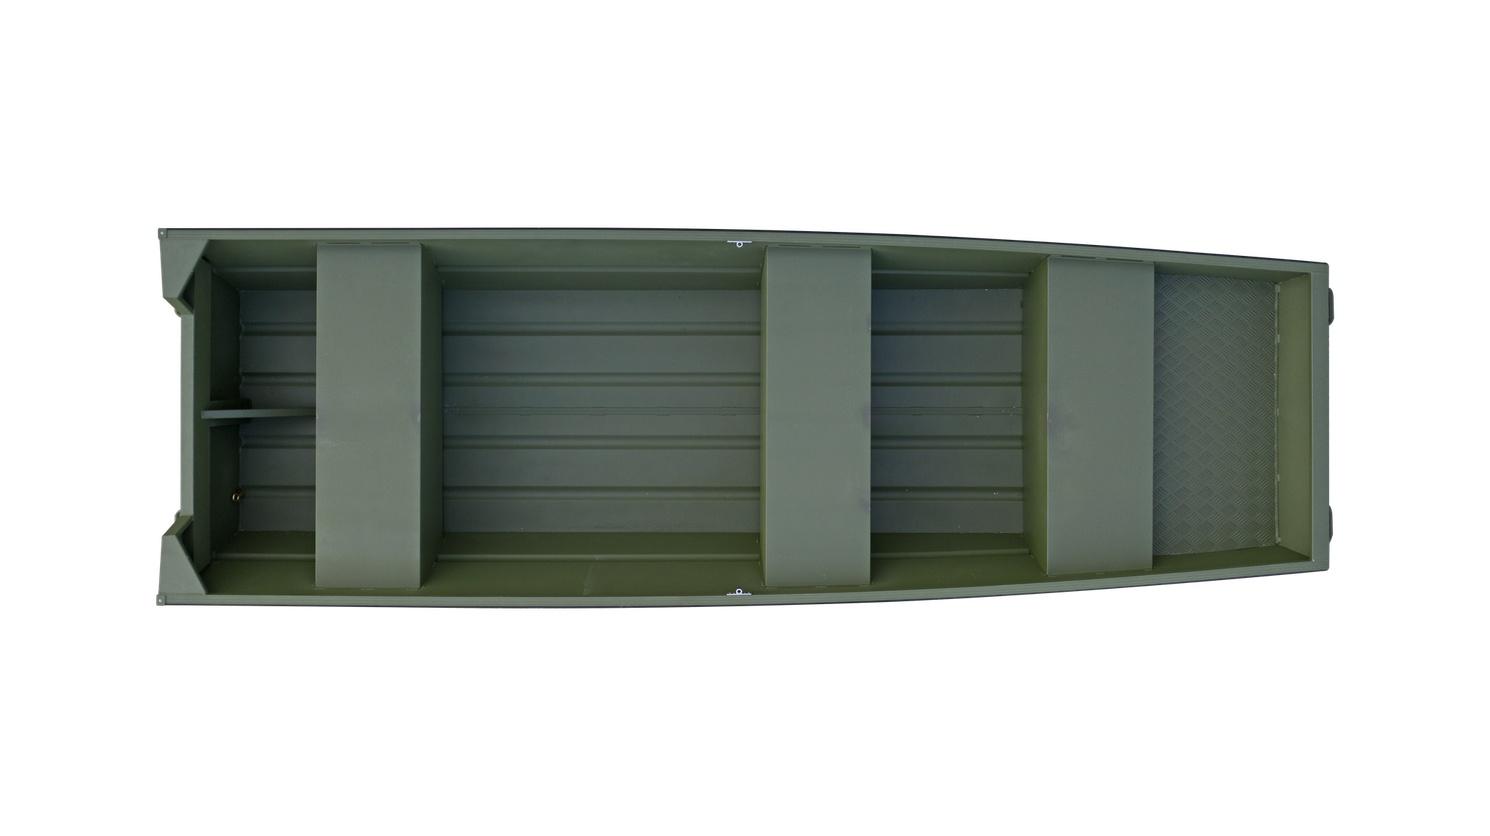 2021 Alumacraft boat for sale, model of the boat is All Weld Jon Series & Image # 4 of 5